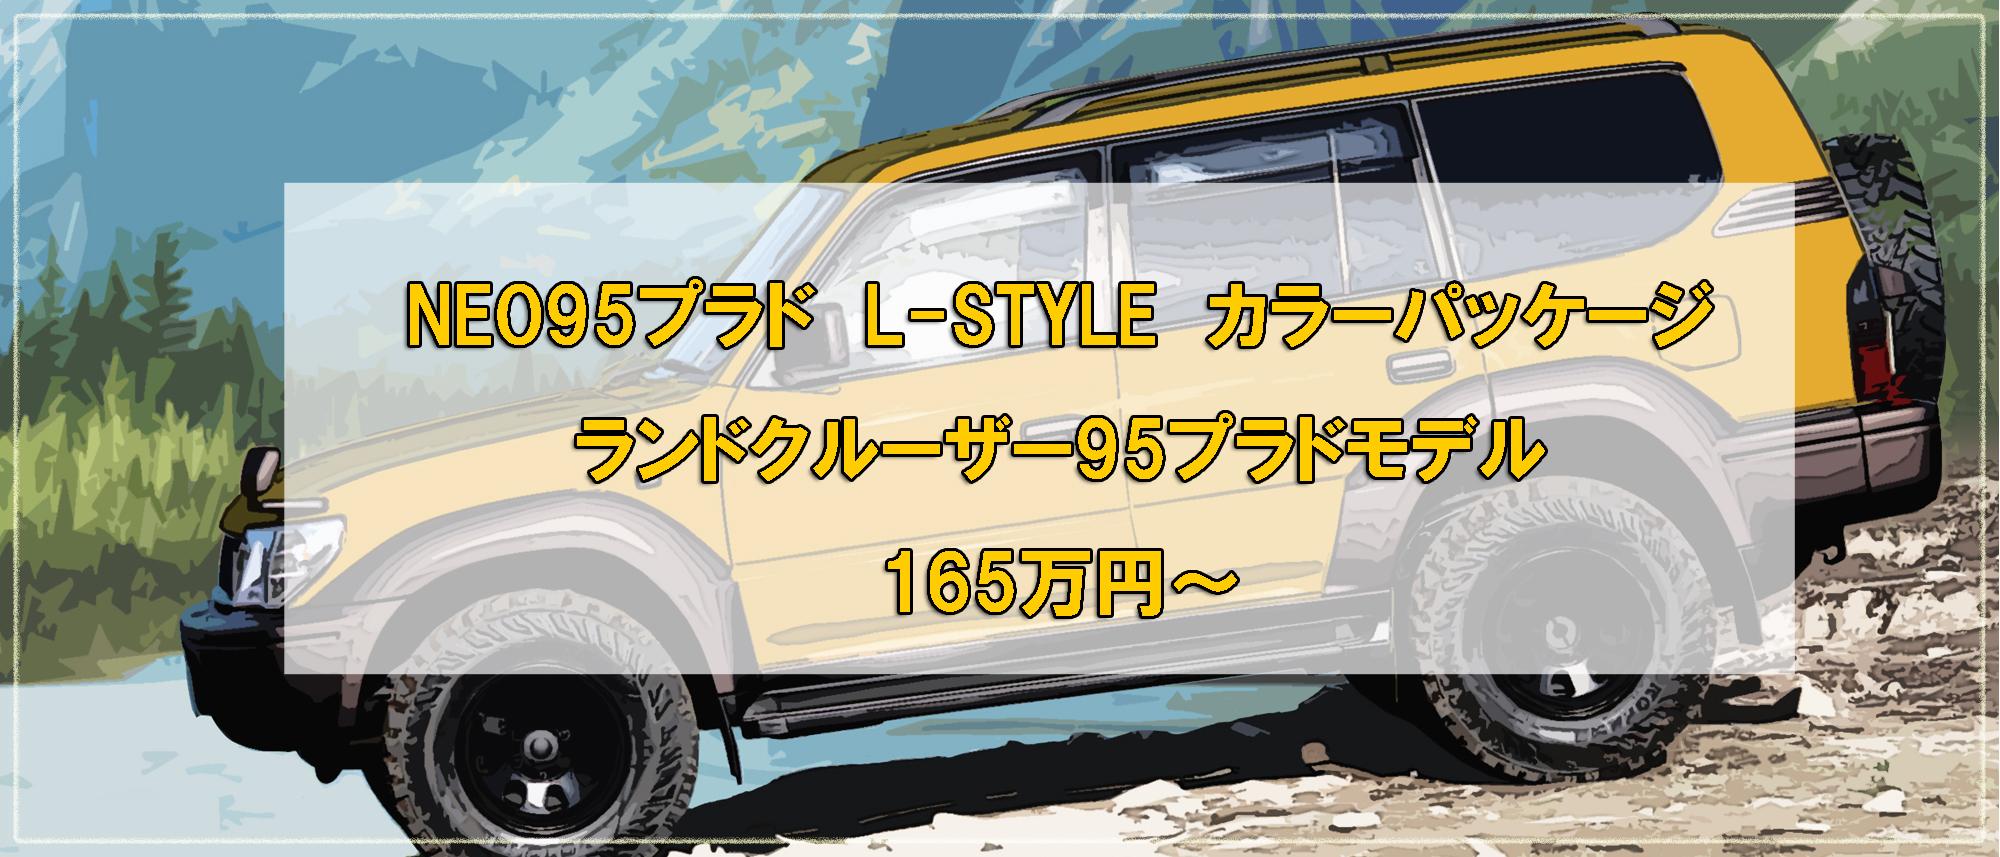 KZJ95カスタムLスタイルカラーパッケージ002